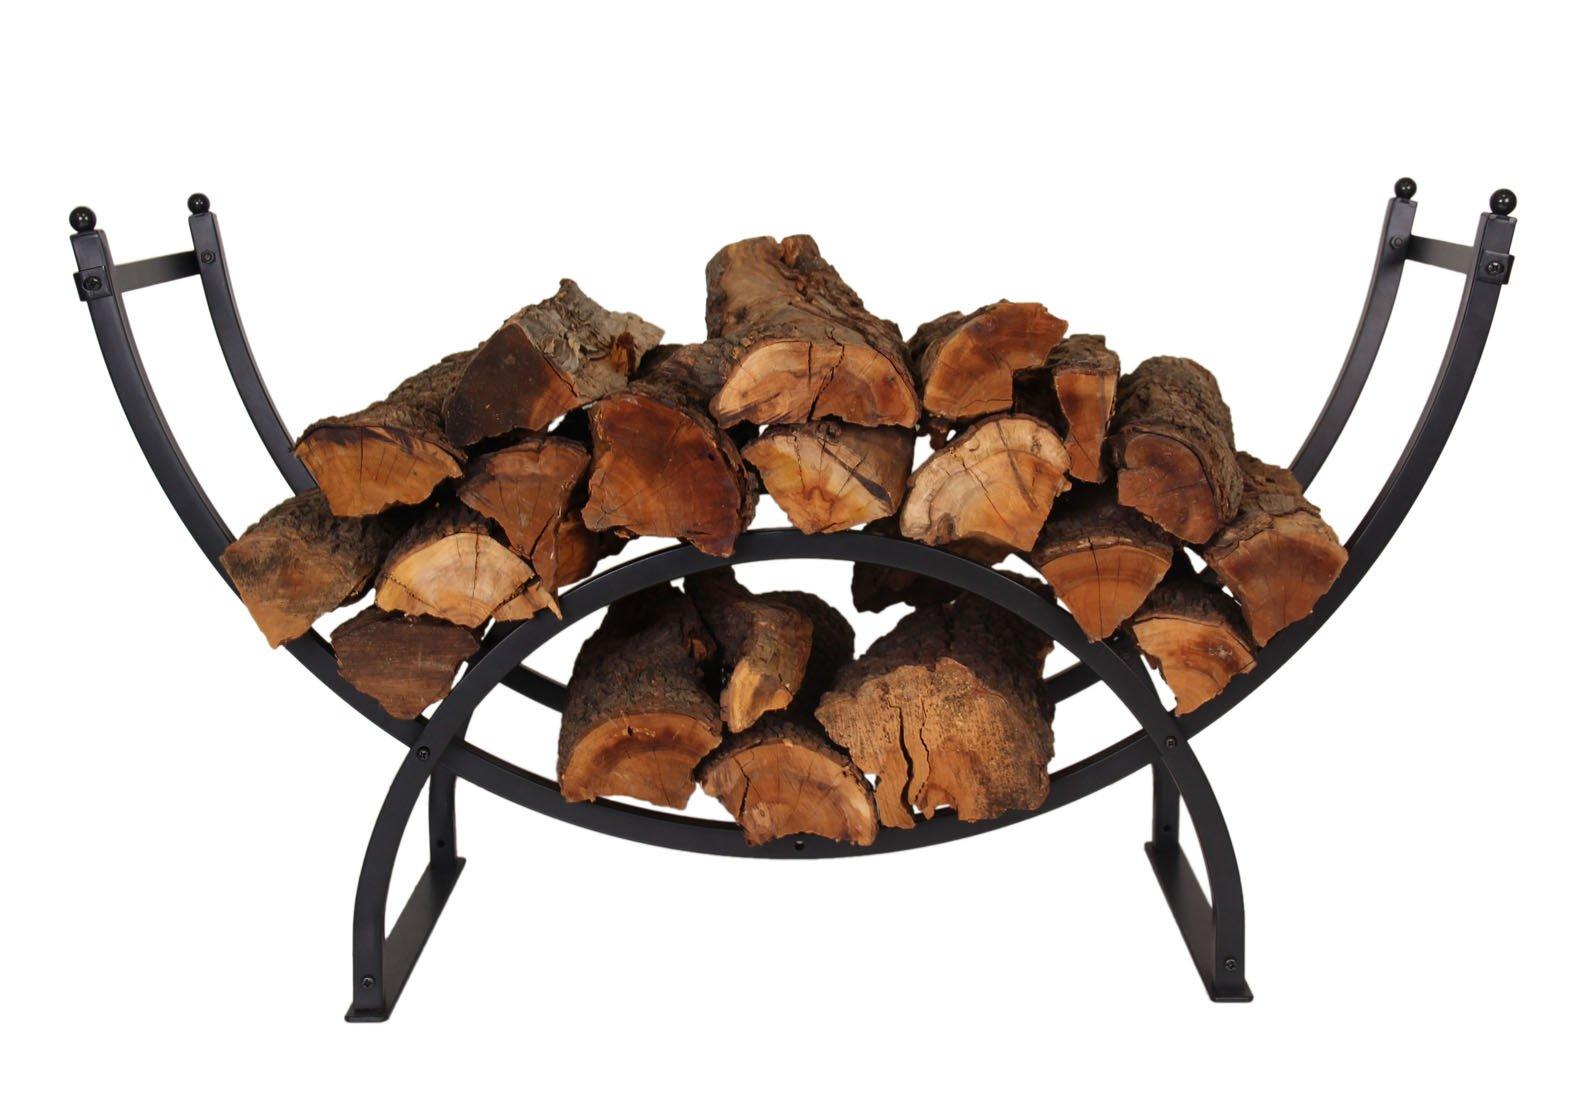 PATIO WATCHER 3-Foot Curved Firewood Rack Log Rack Firewood Storage Log Holder for Indoor Outdoor Backyard Fireplace, Heavy Duty Steel Black by PATIO WATCHER